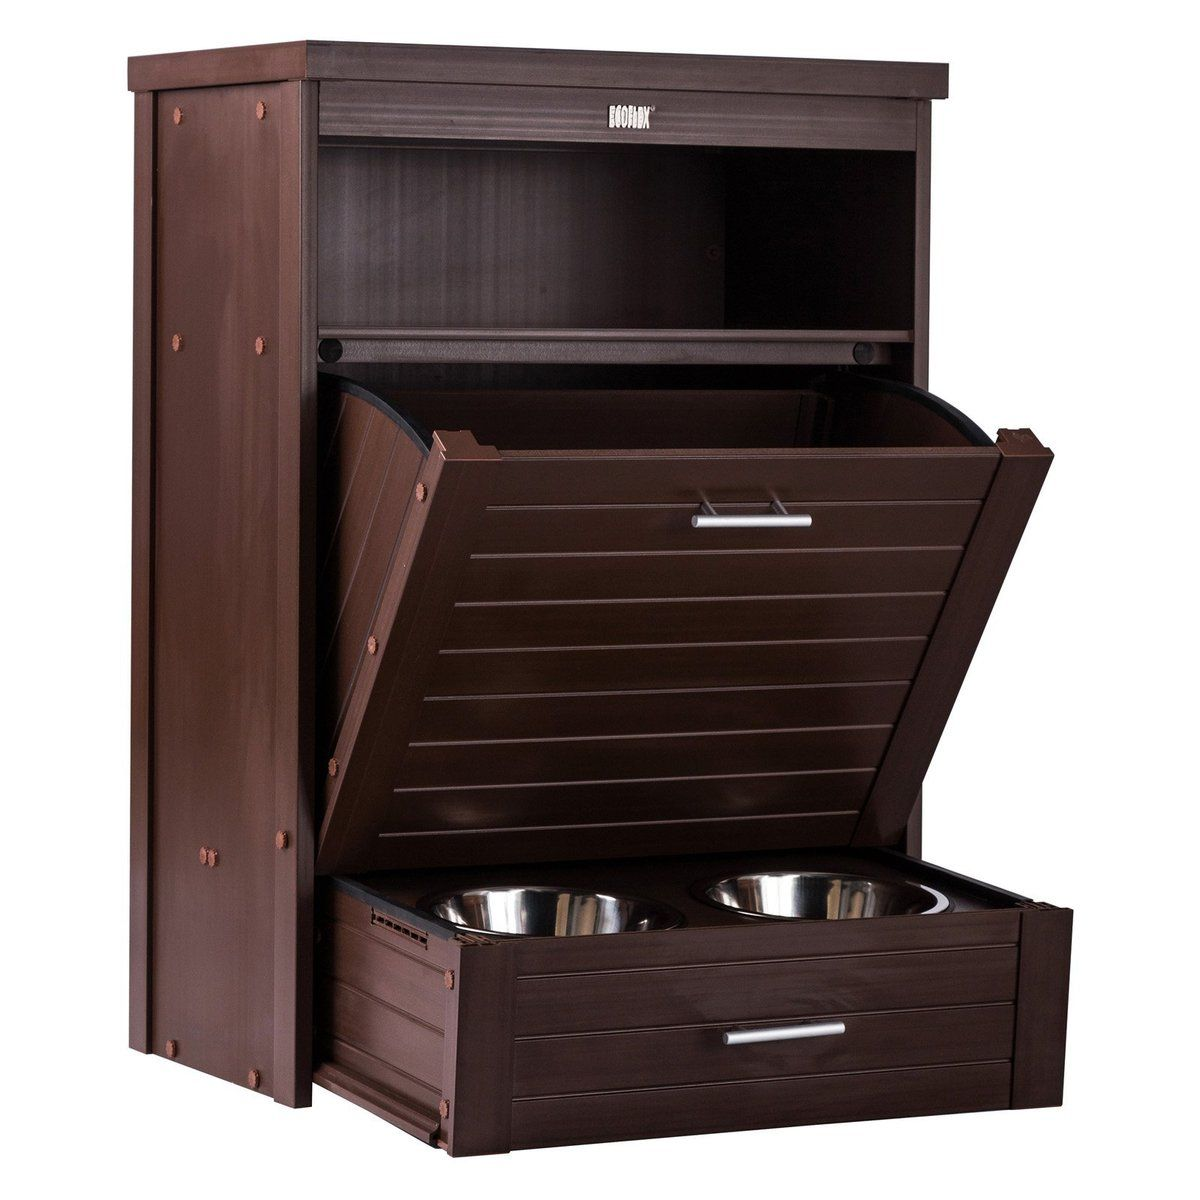 Darlas pet pantry feeder furniture food storage